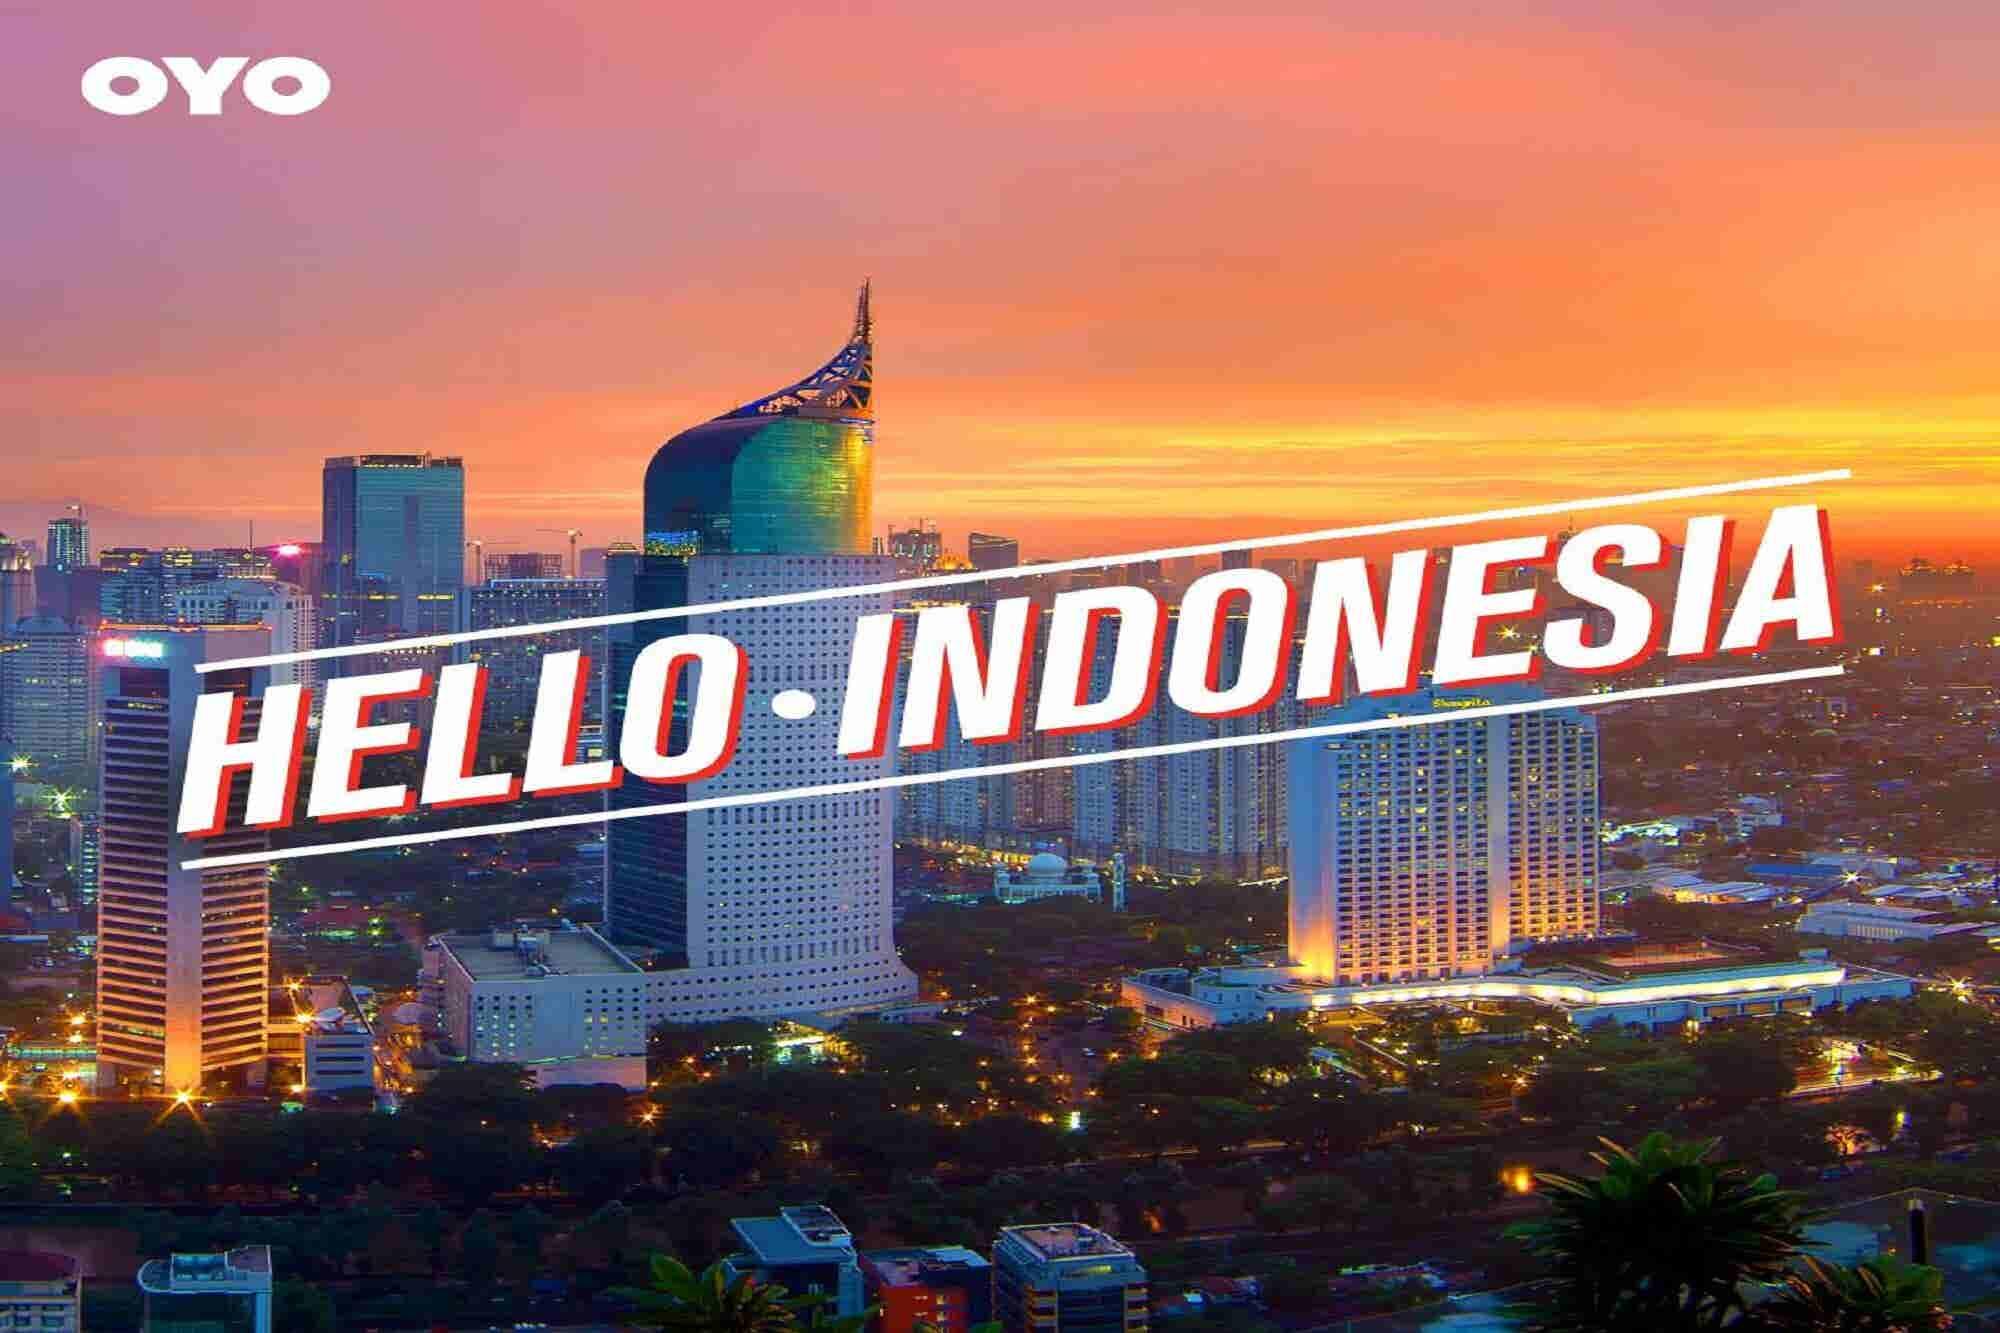 OYO Announces $100 Million Plan to Strengthen Its Southeast Asia Presence